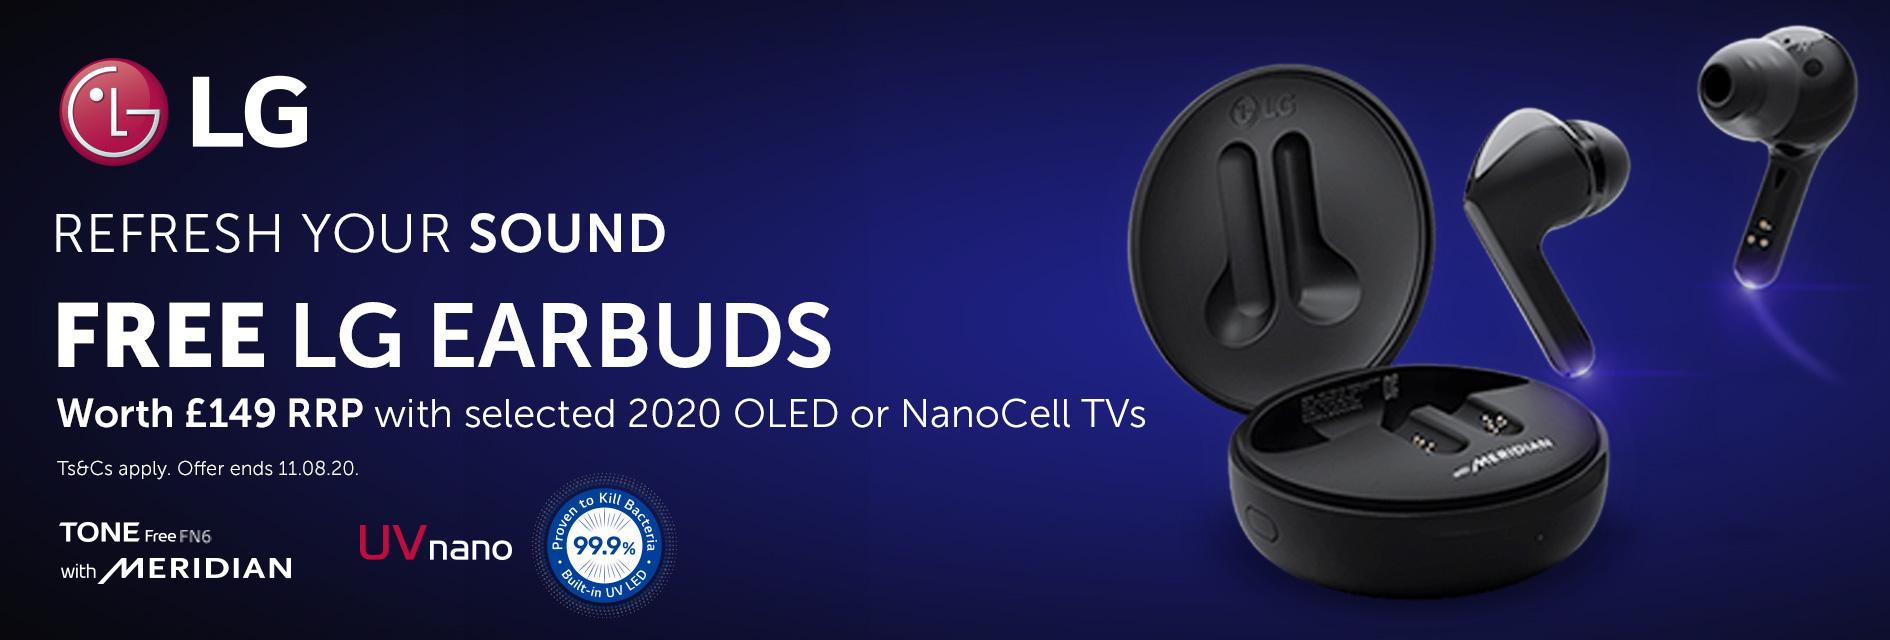 LG Free earbuds worth £149